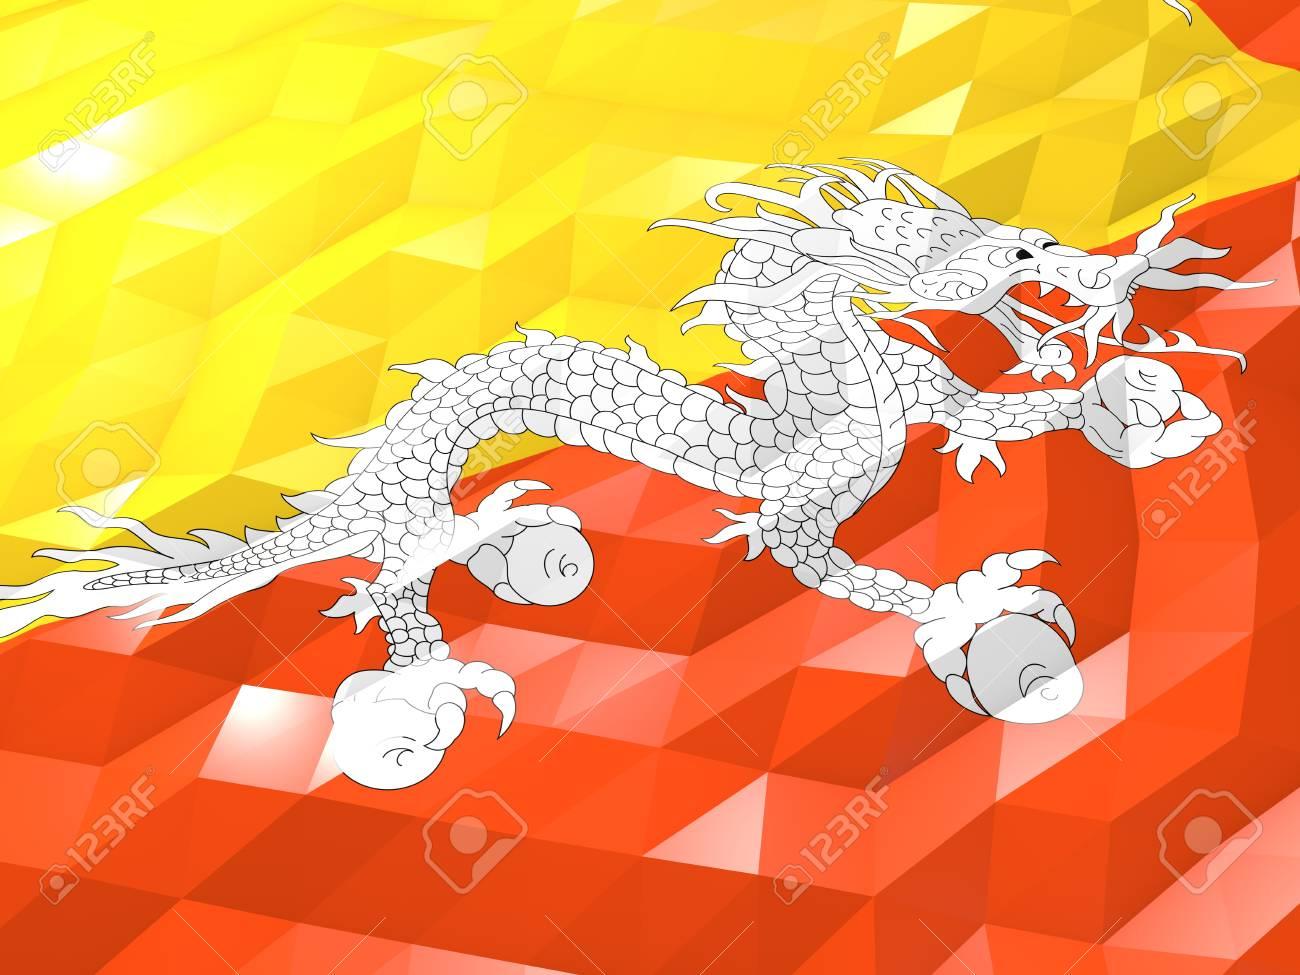 Drapeau Du Bhoutan Fond Décran 3d Illustration Symbole National Low Style Origami Glossy Polygonal